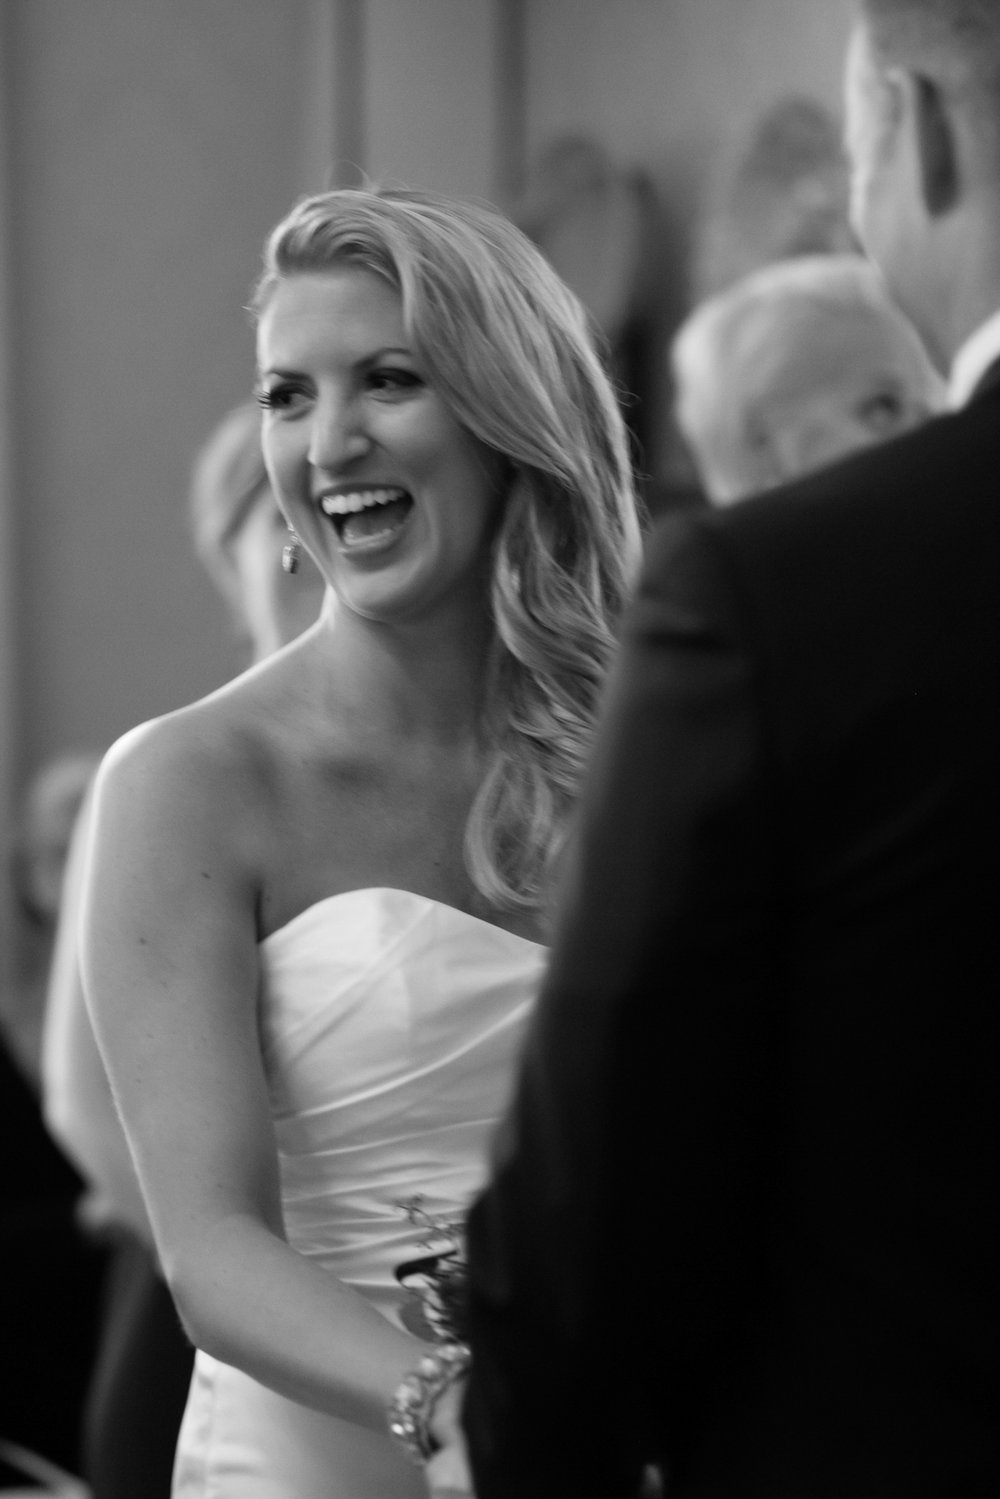 New-york-city-weddings-108.jpg